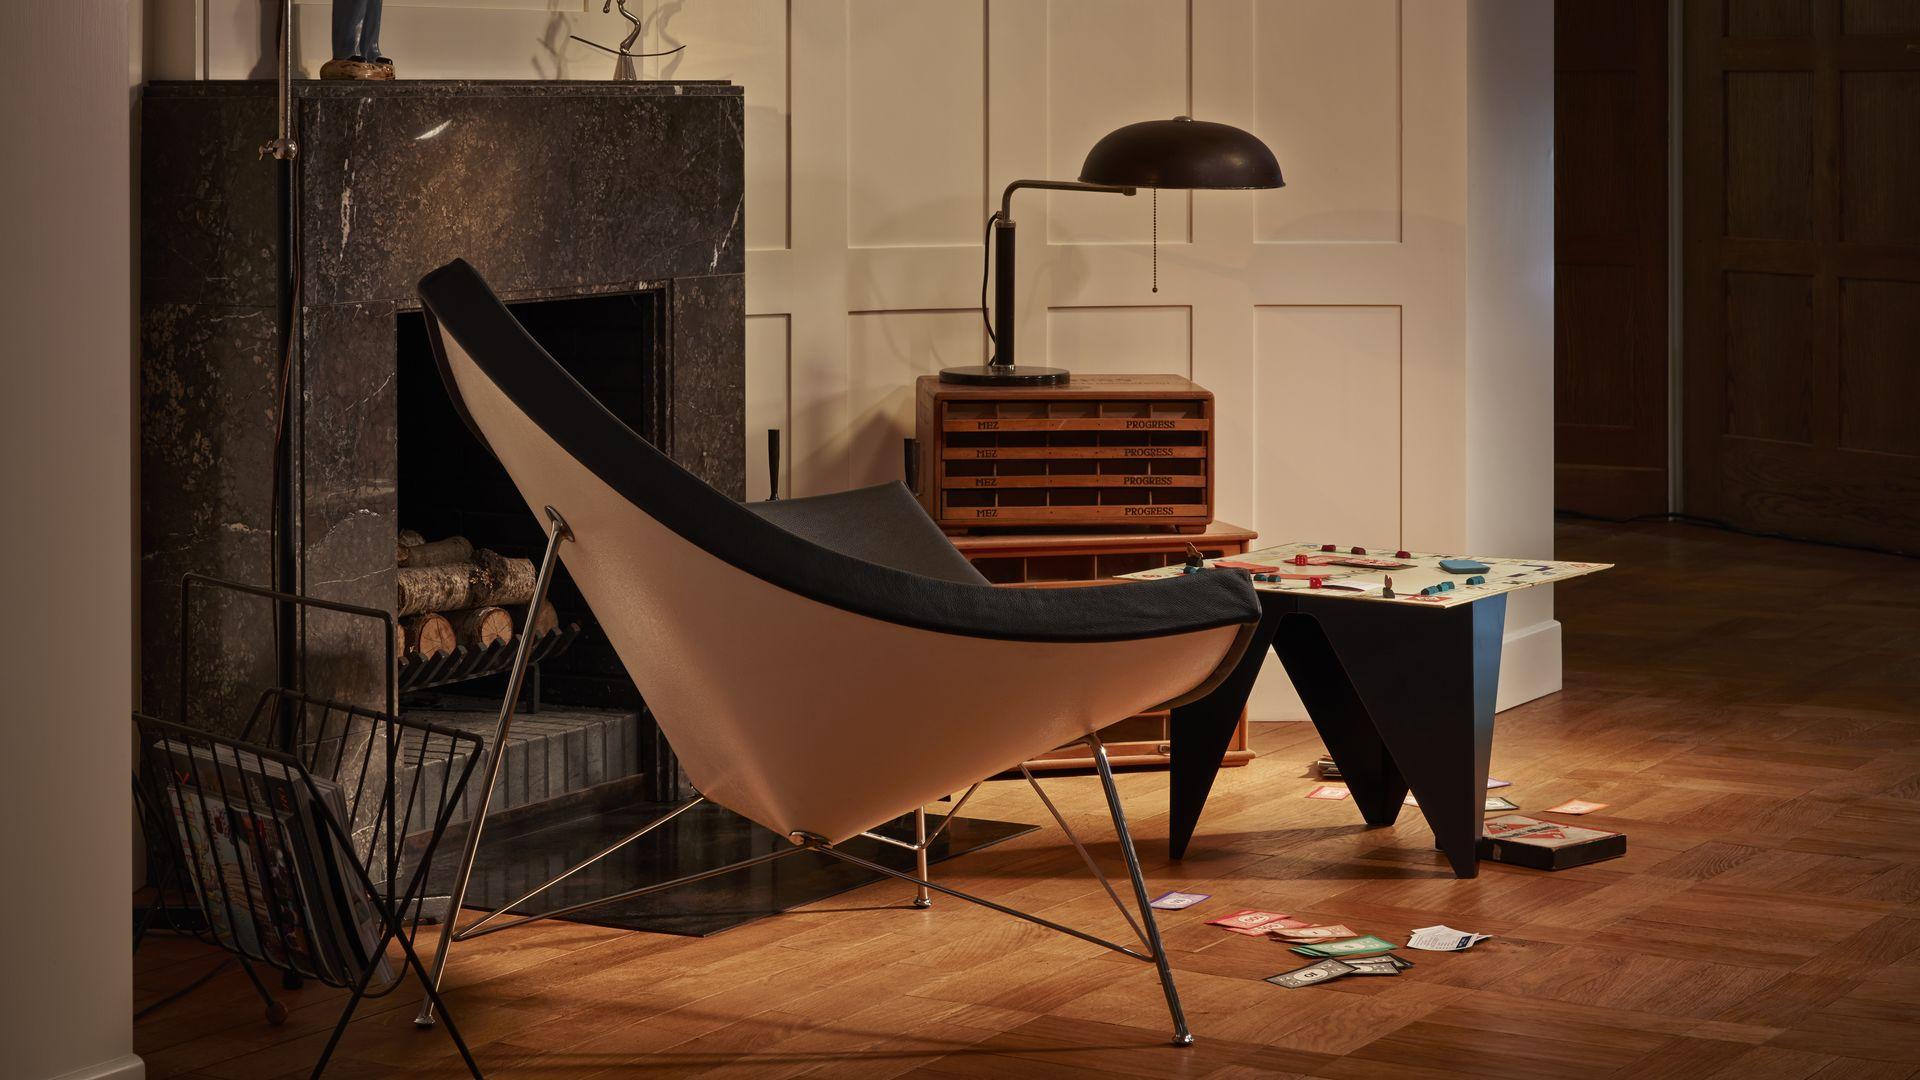 Coconut Chair, Prismatic Table_web_parallax